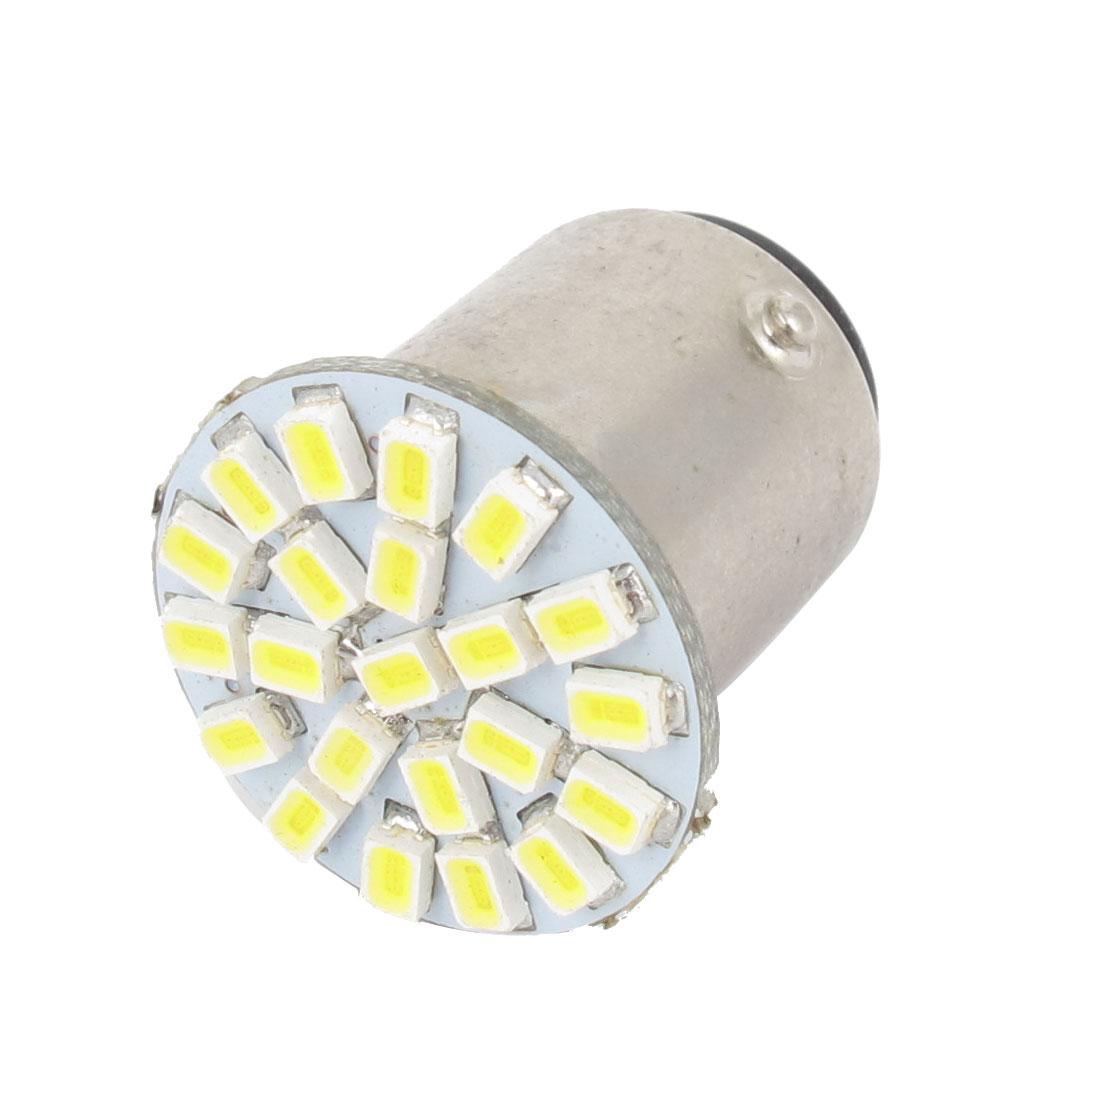 1157 BAY15D 22 White 5050 SMD LED Auto Car Brake Corner Signal Light